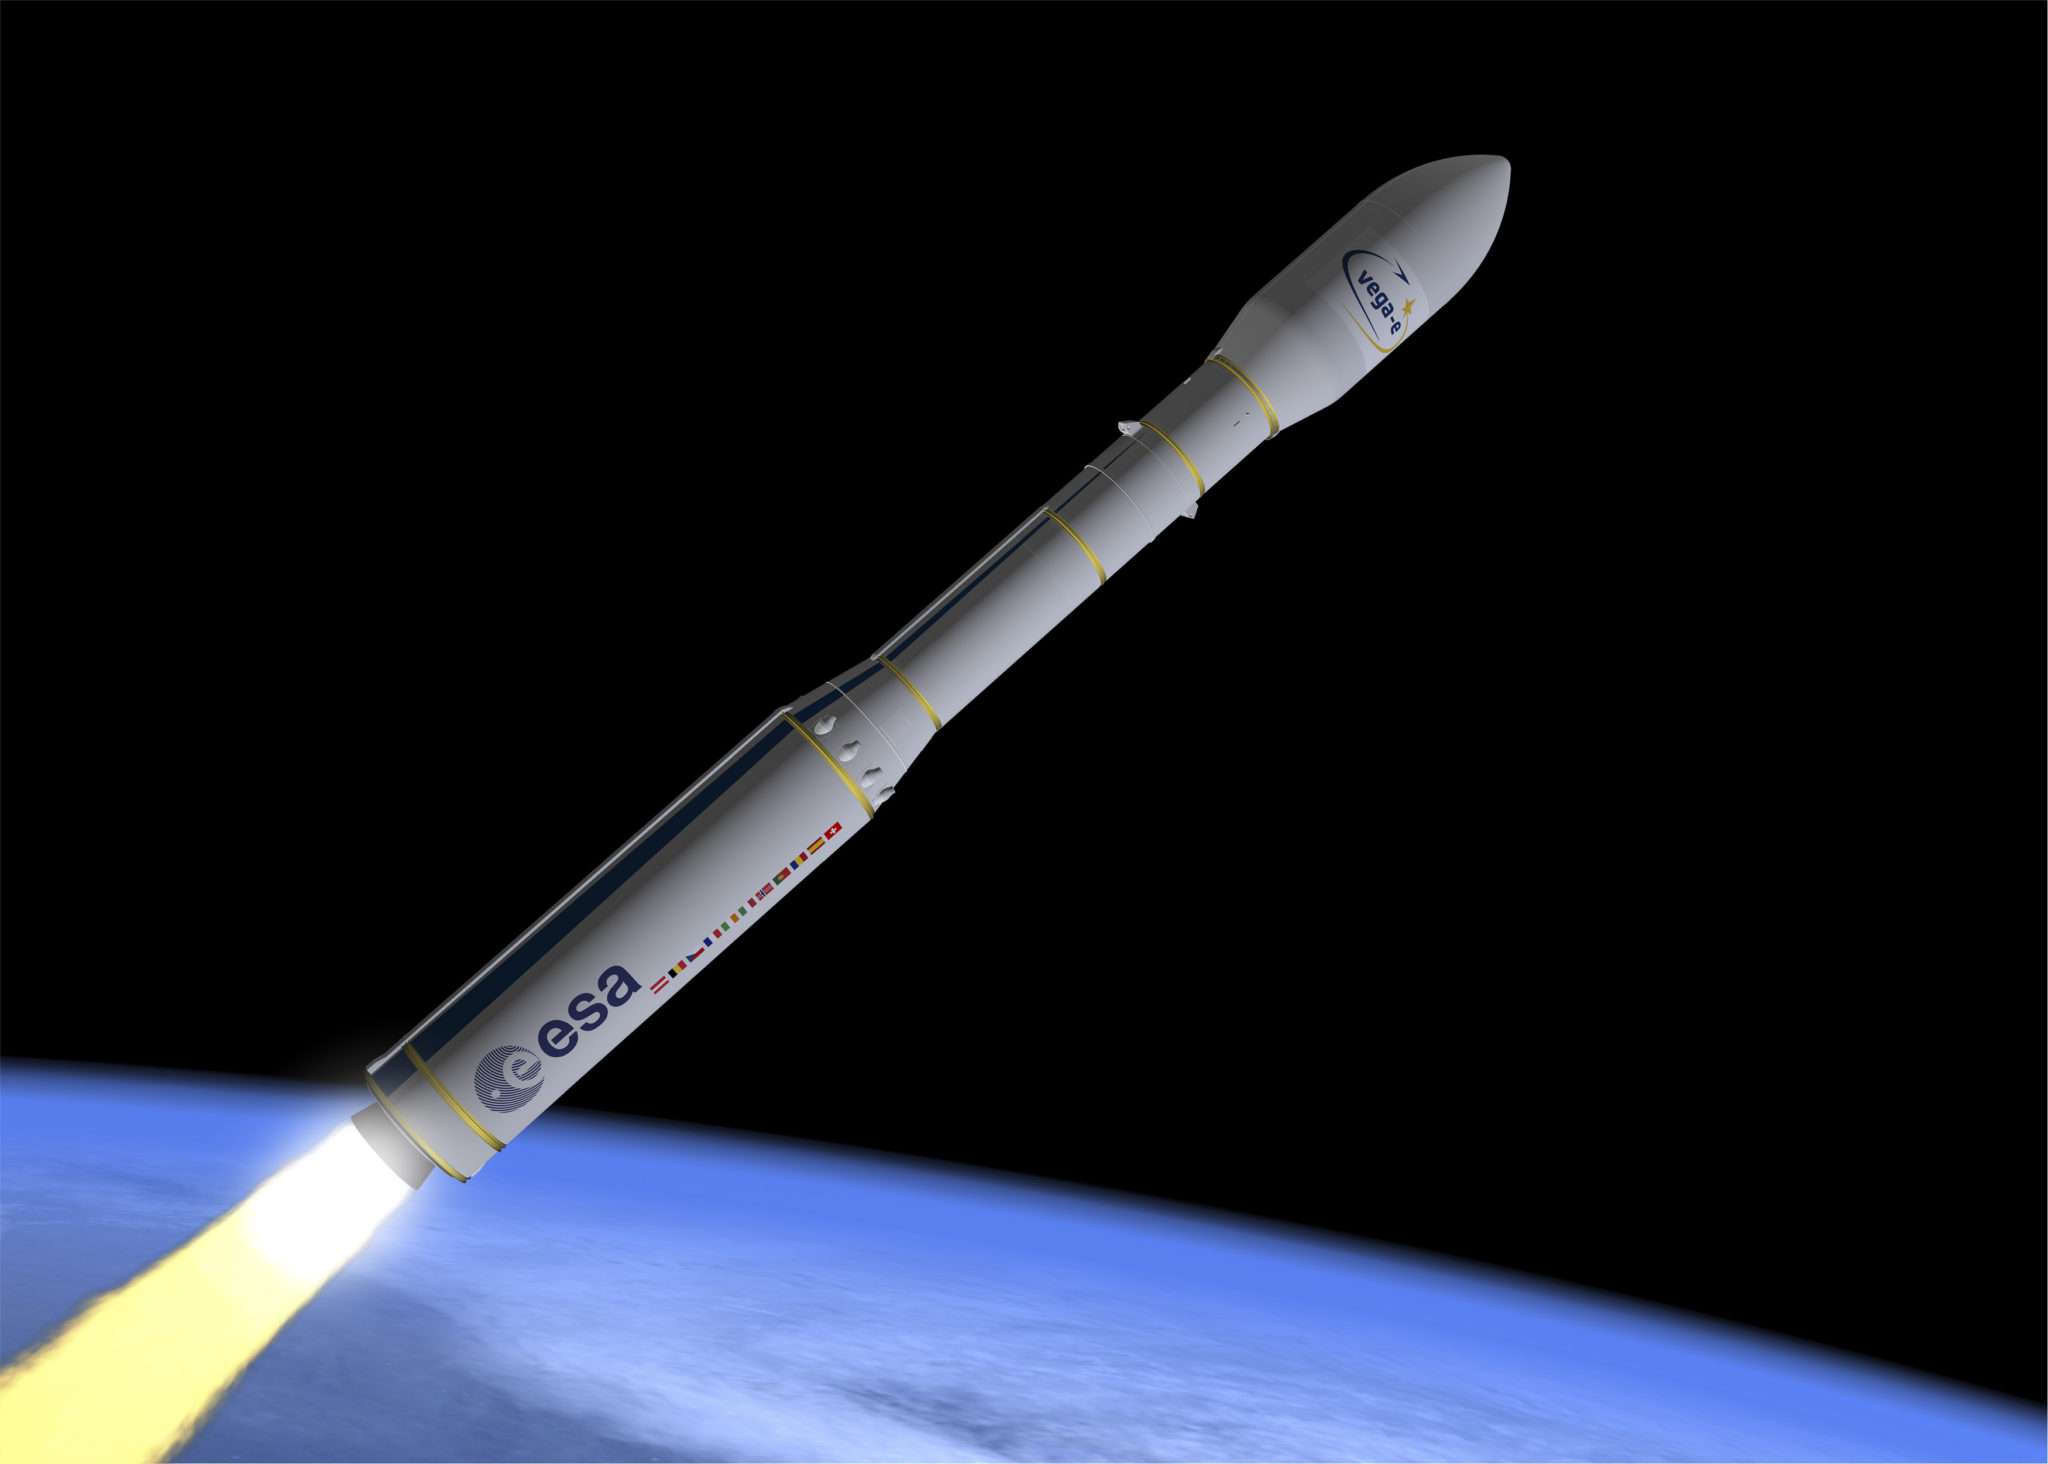 Vega-E Avio ESA